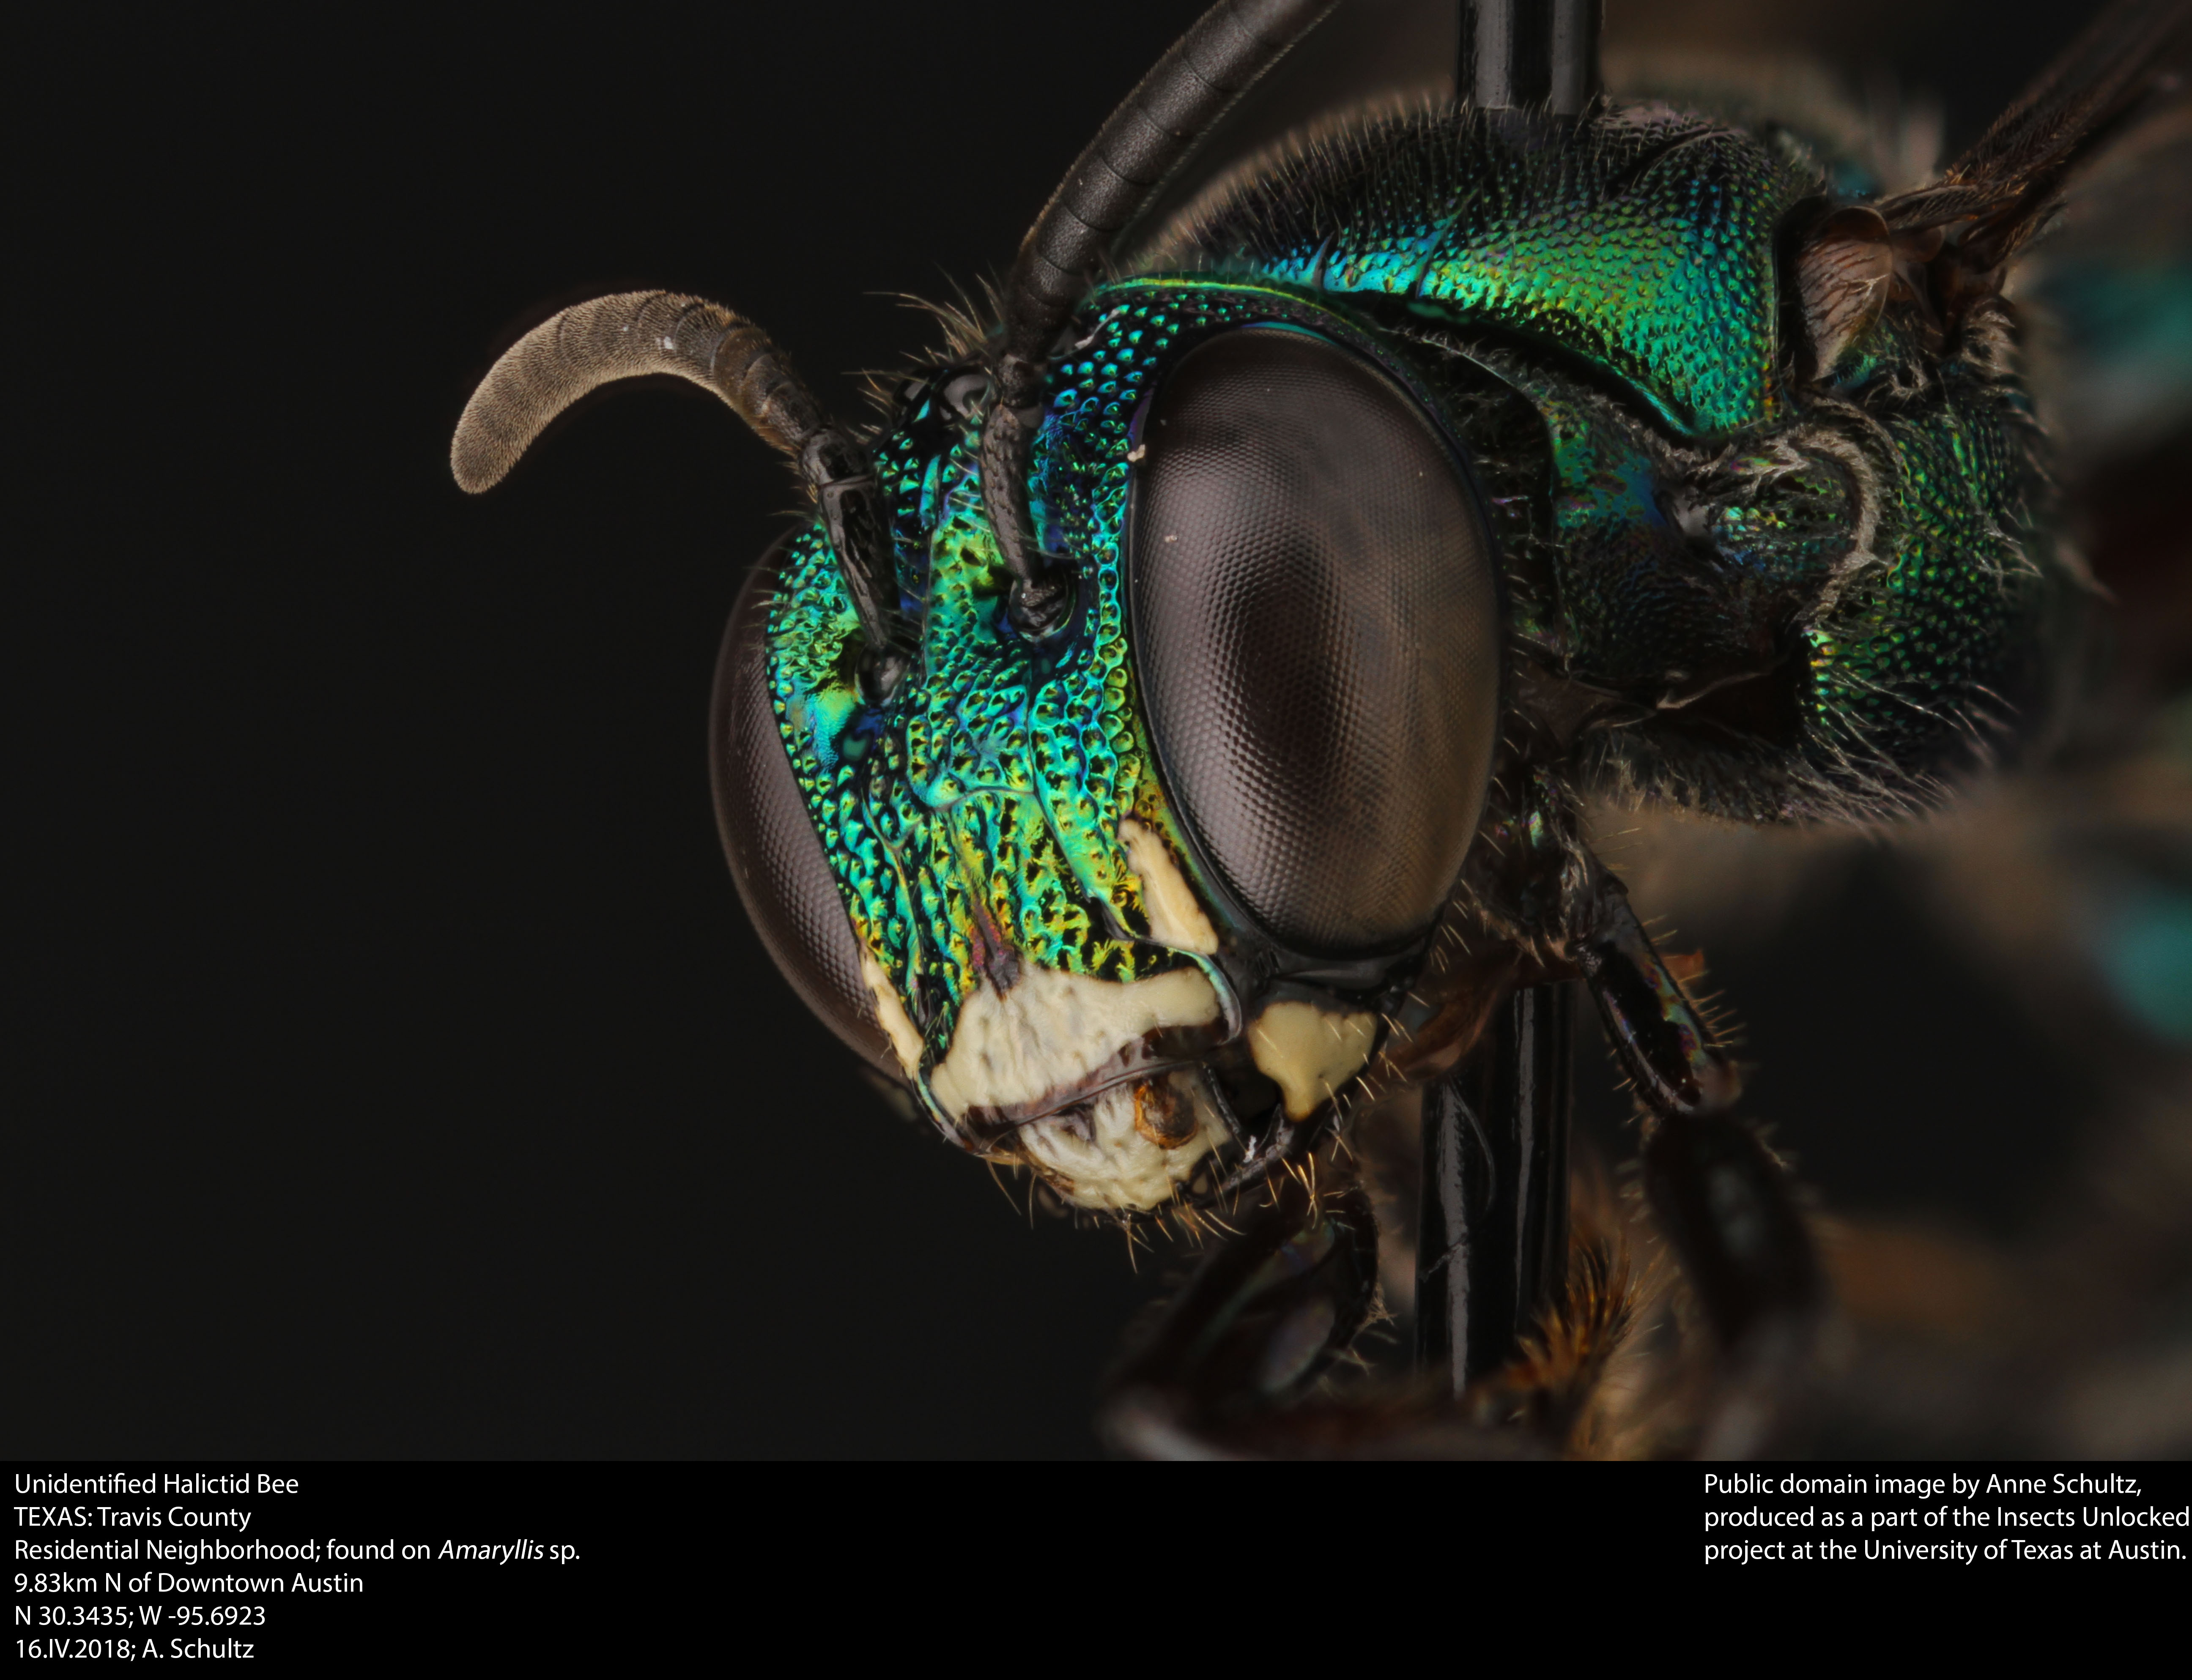 Unidentified halictid bee photo